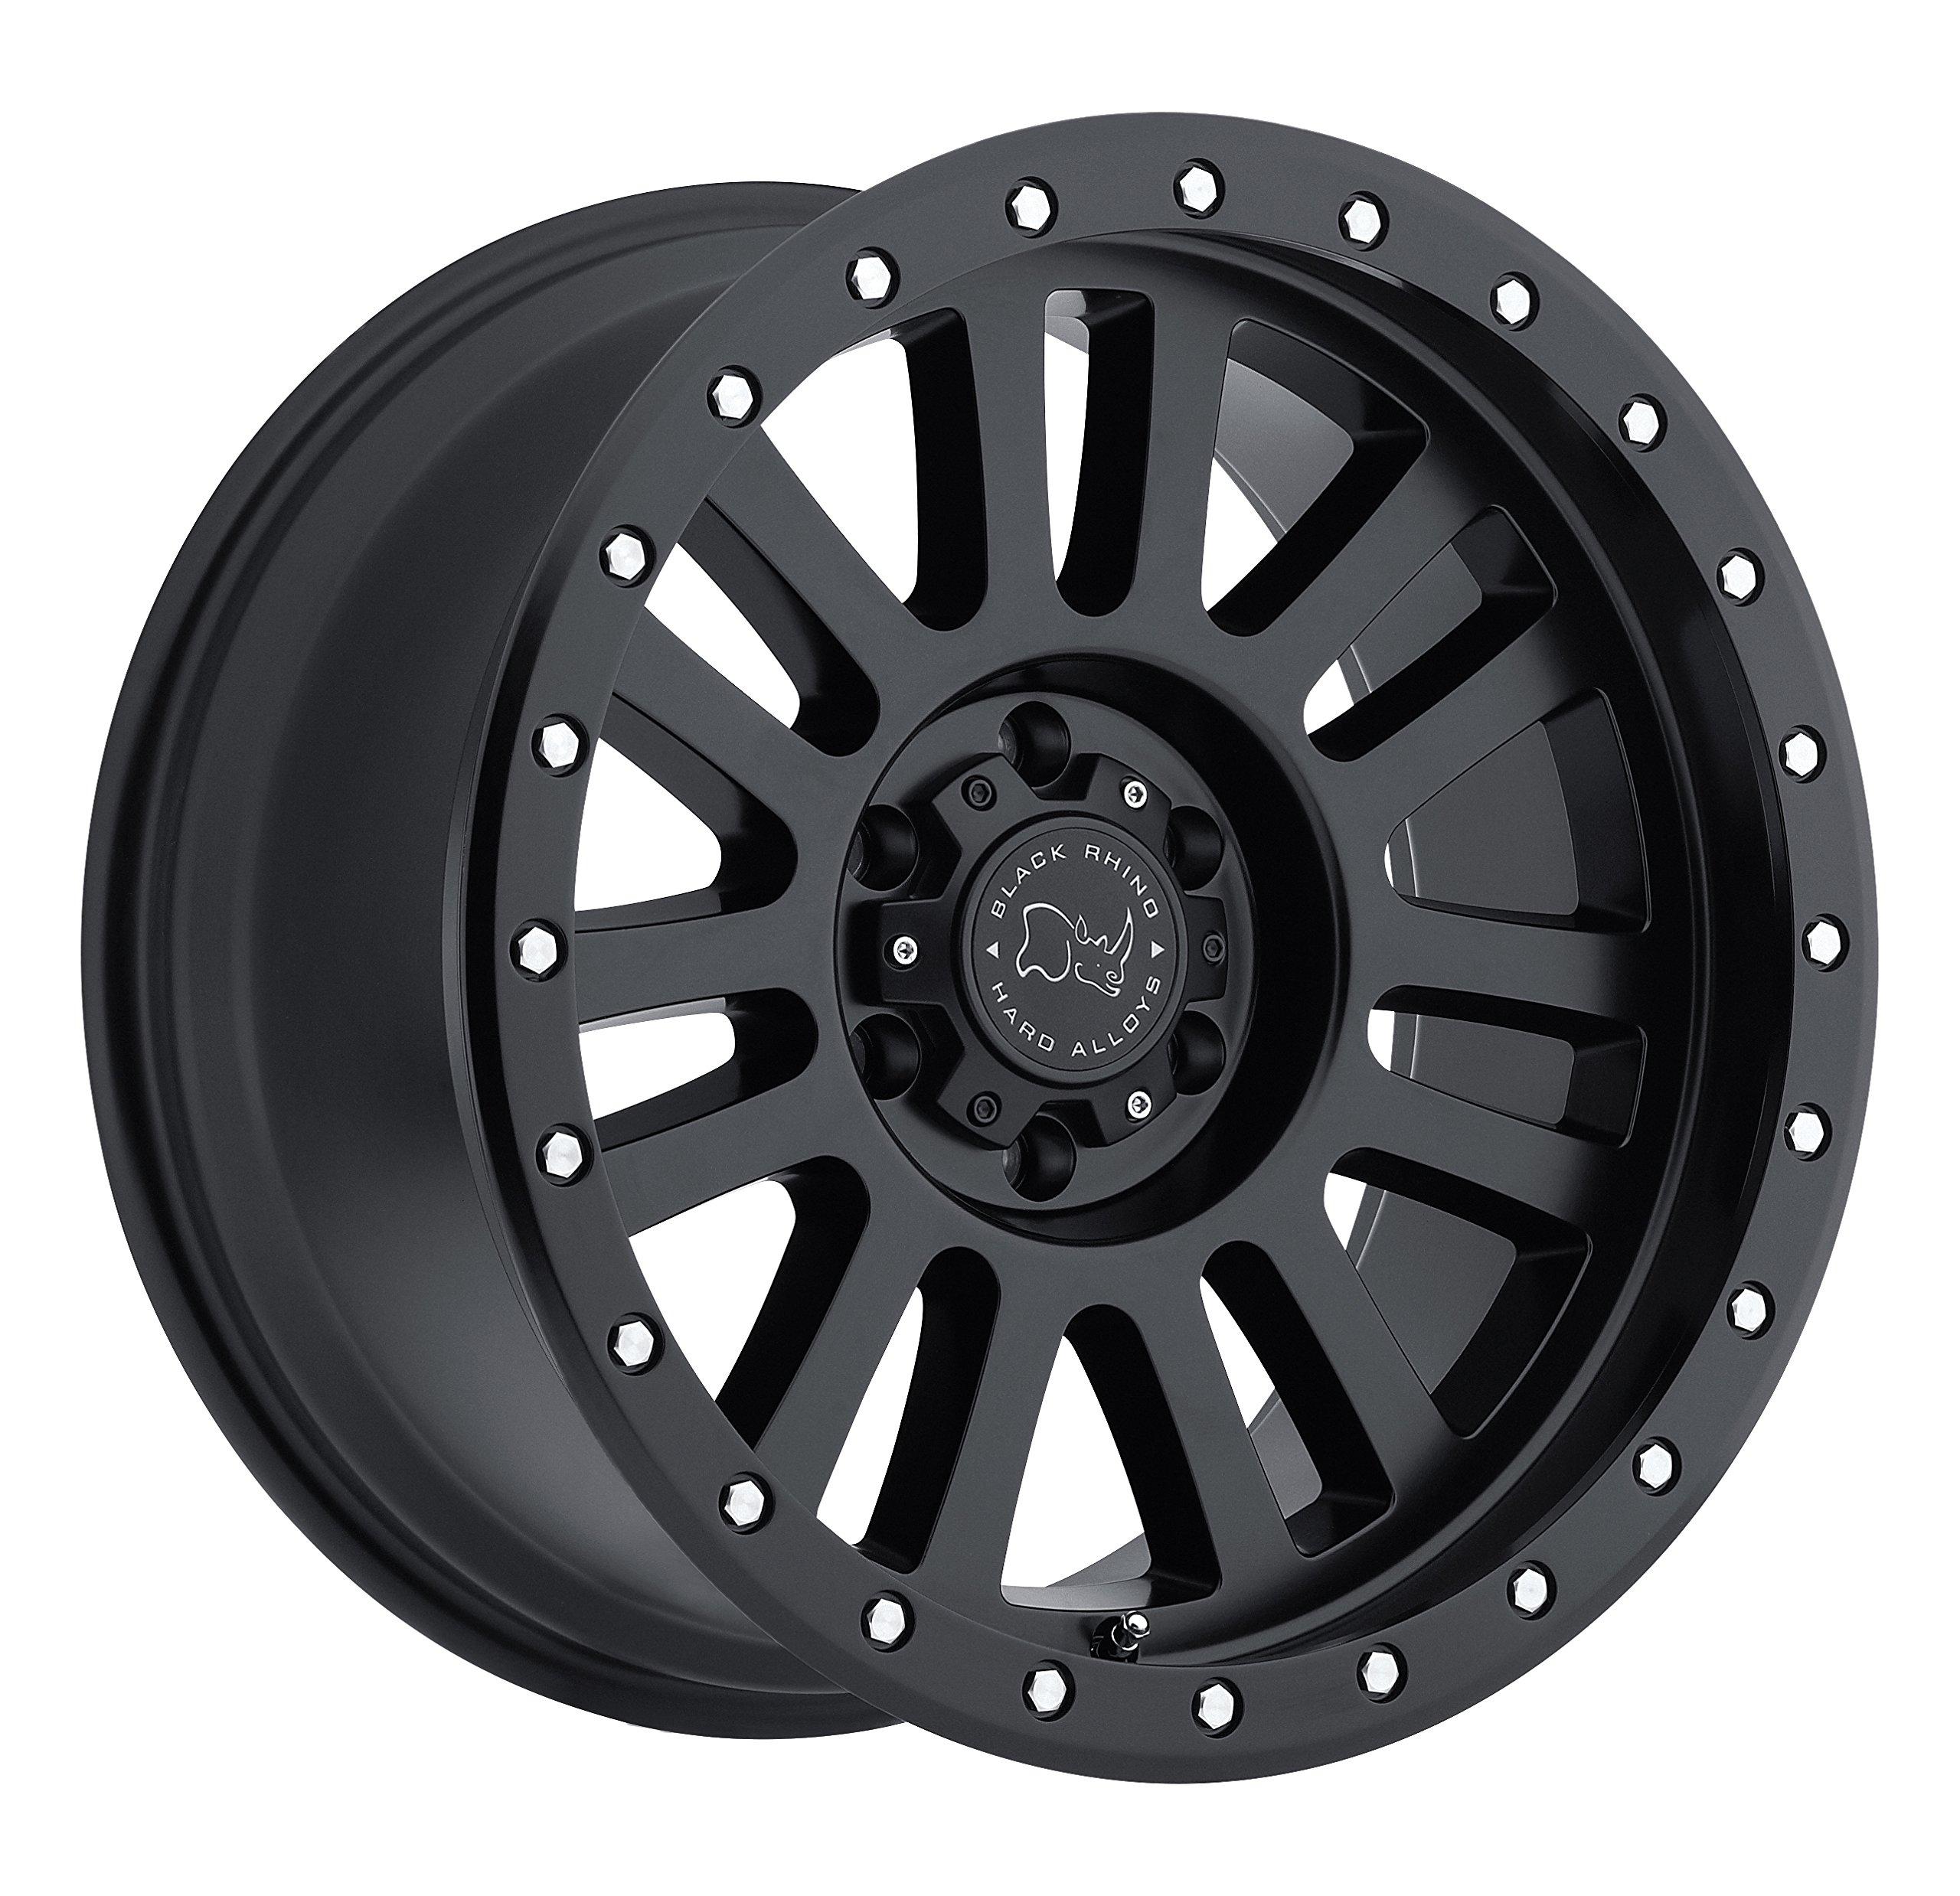 Black Rhino EL CAJON Black Wheel with Painted Finish (18 x 9. inches /6 x 139 mm, 12 mm Offset)